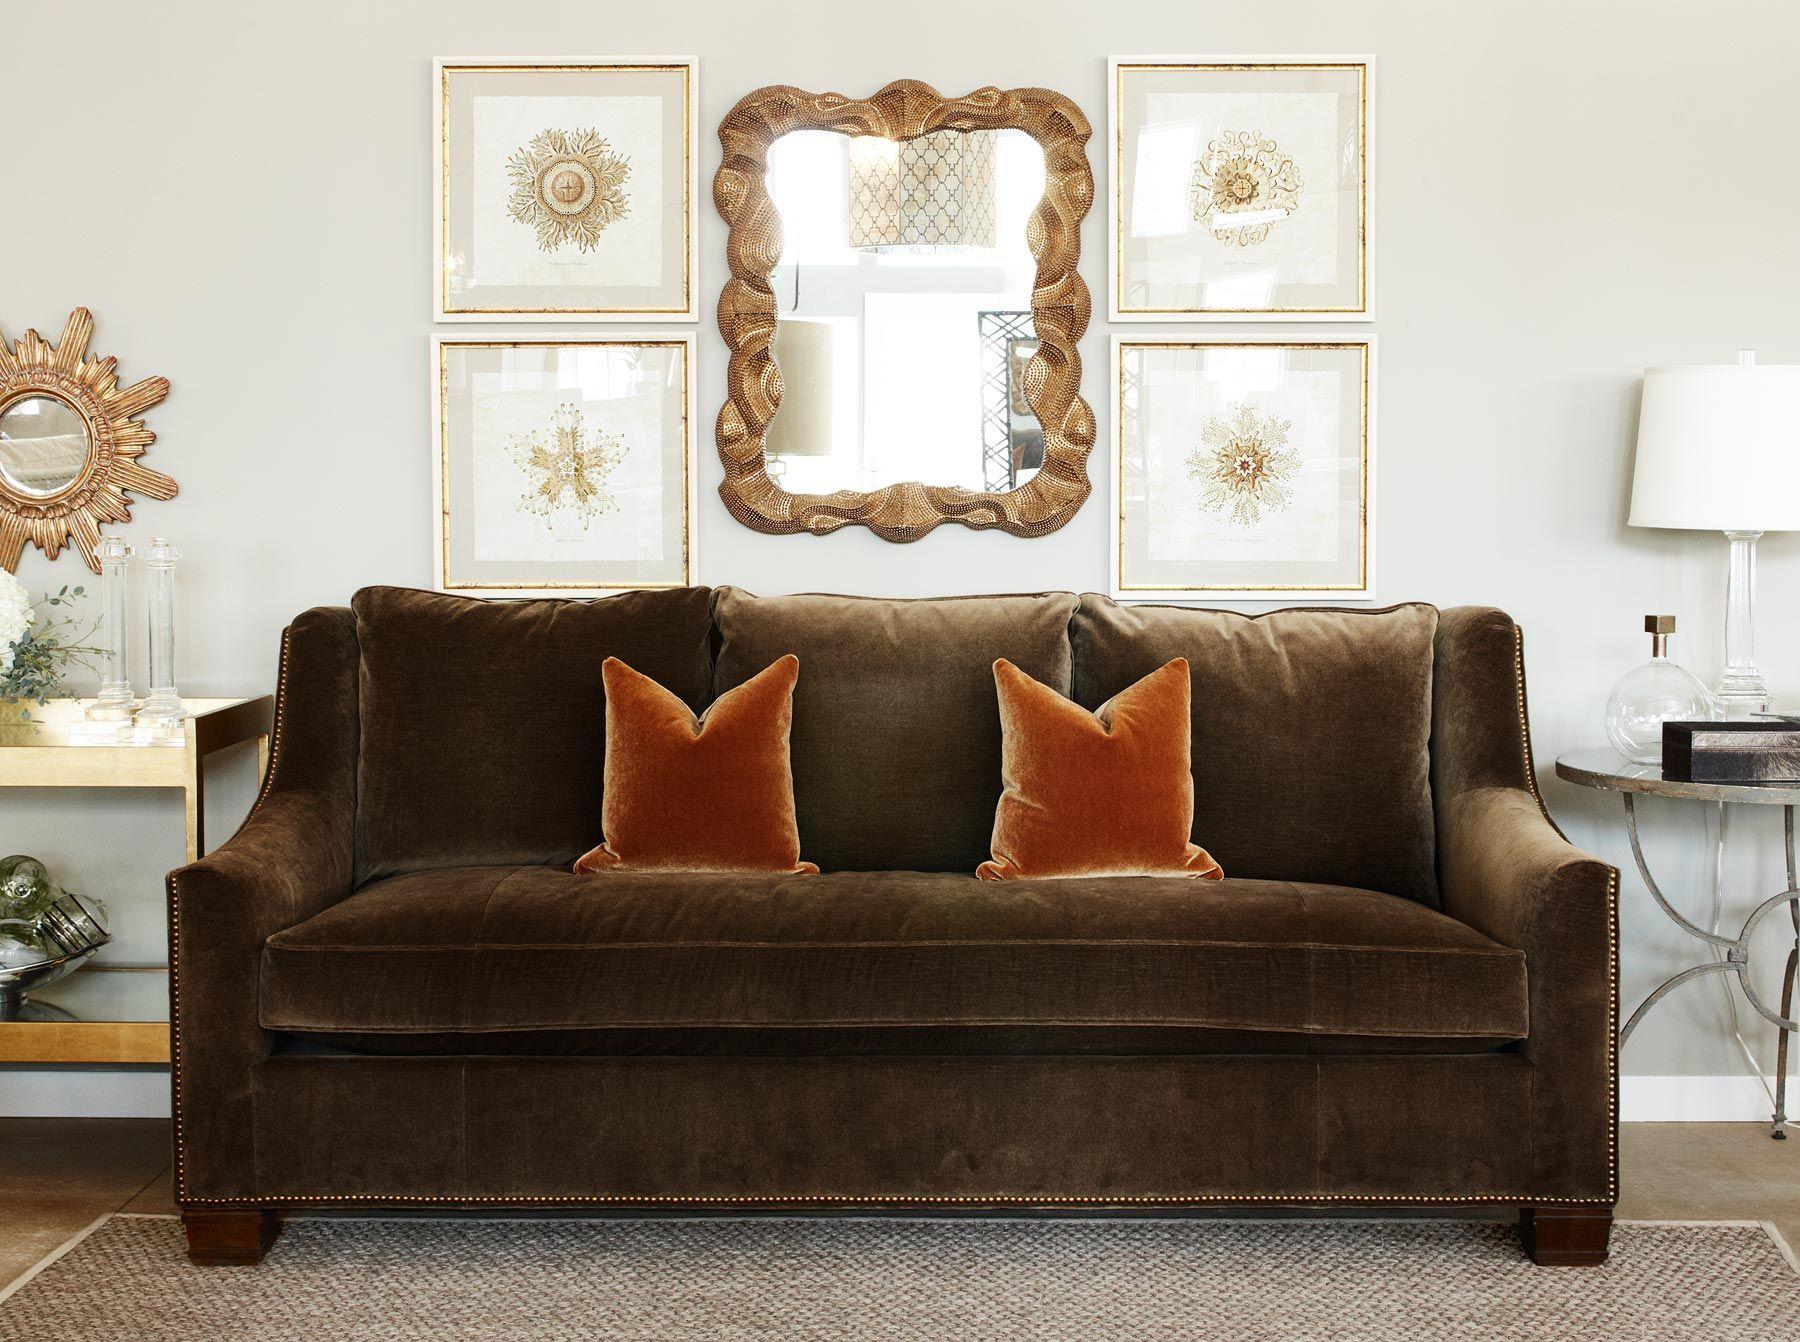 Hickory Chair sutton sofa Showroom Settings